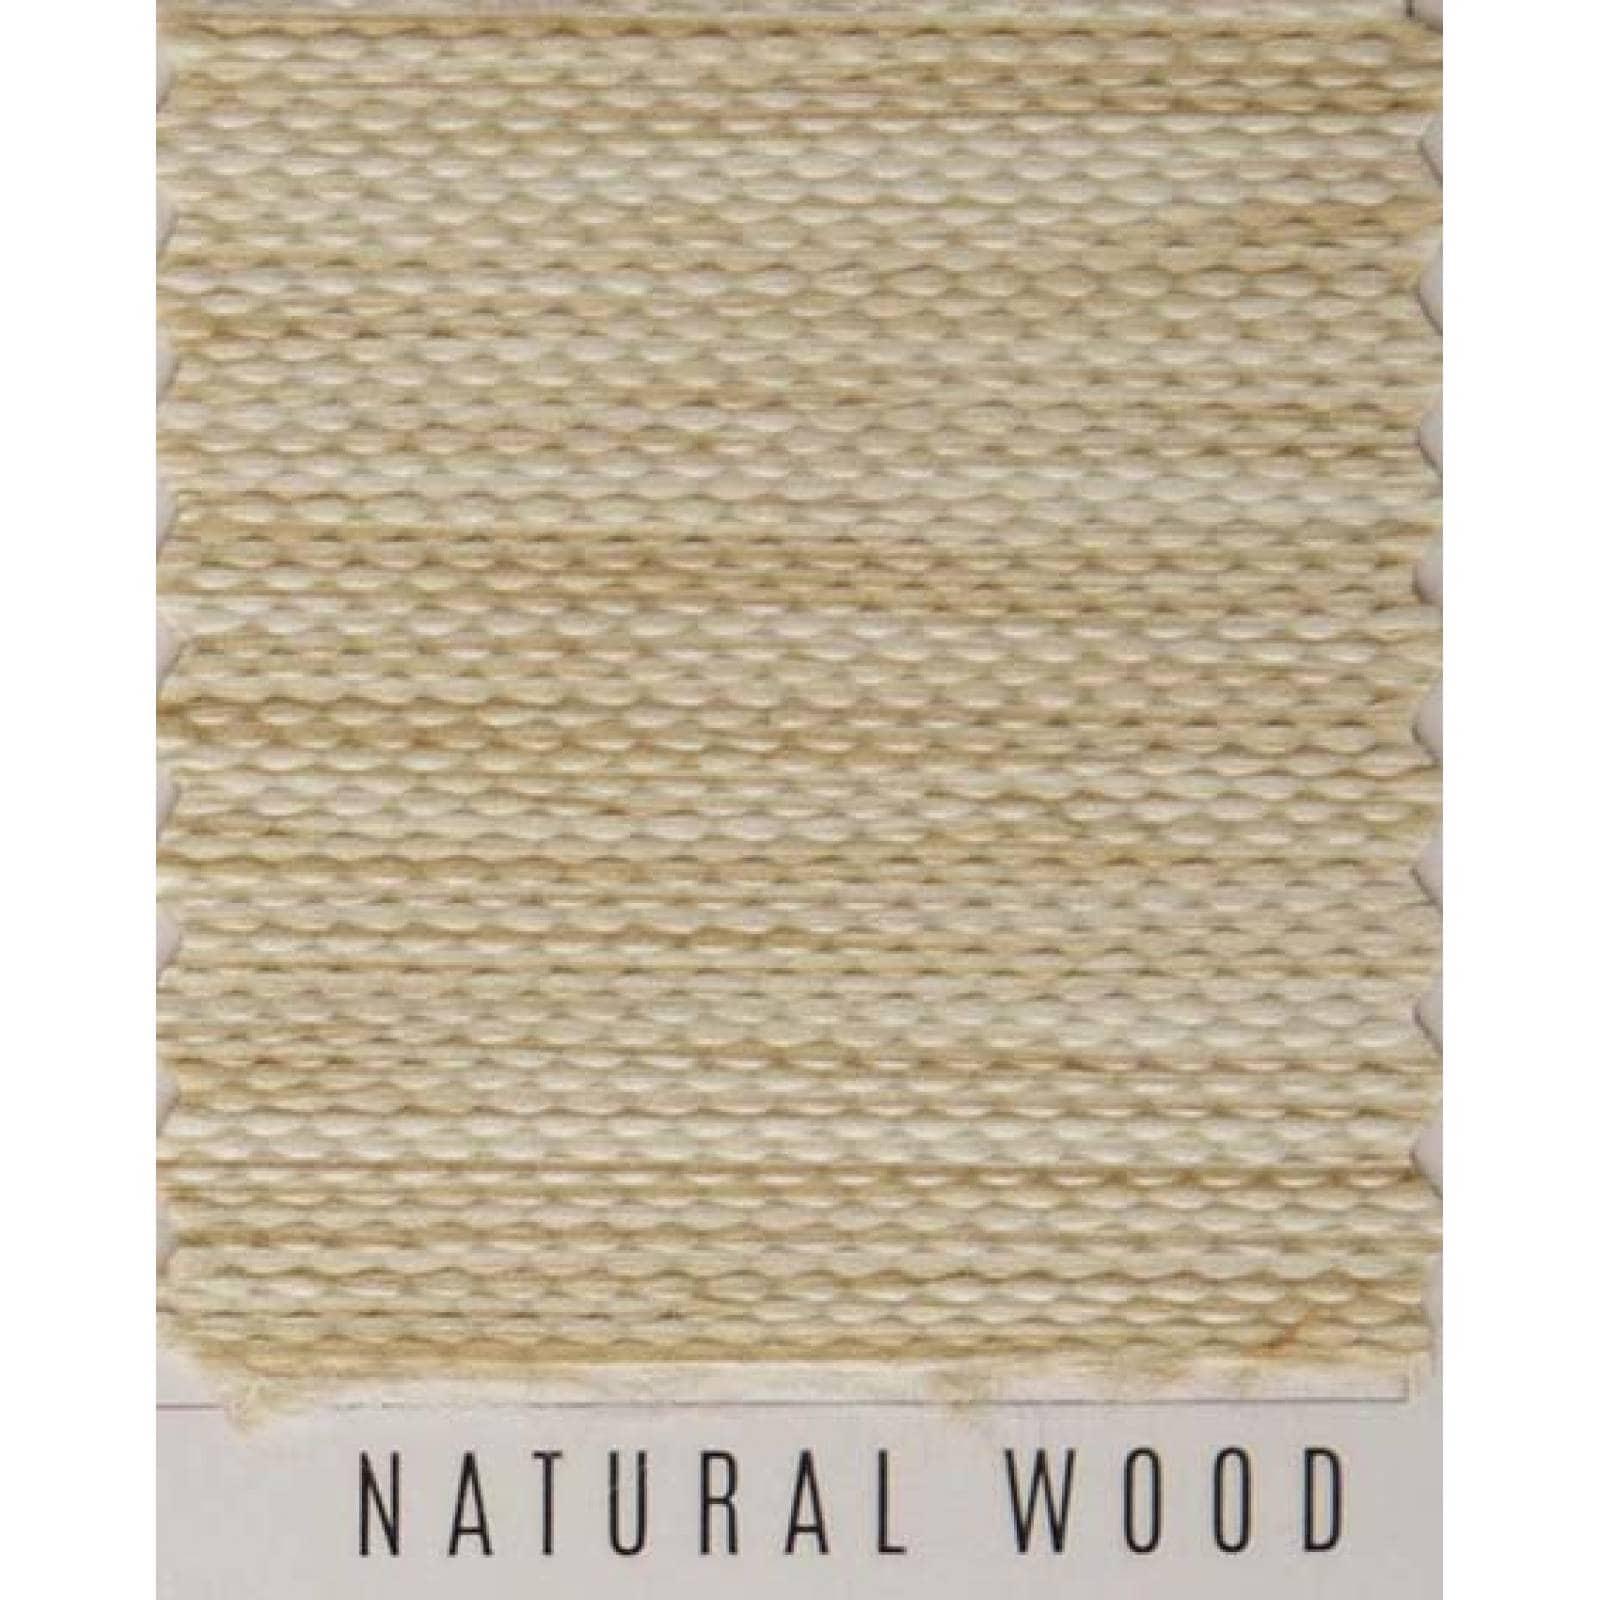 Persianas Sheer Elegance modelo Wood line 220 cm de ancho X hasta 150 cm de largo